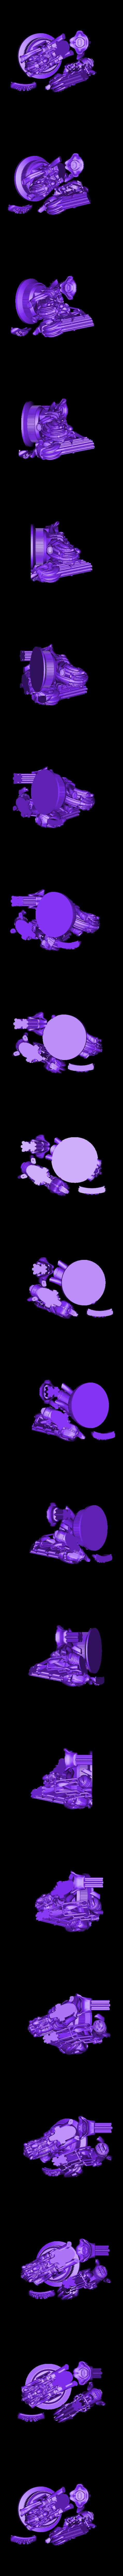 jockey_parts_plate.stl Download free STL file Alien Jockey Commemorative Bust / Model • 3D printable design, Geoffro